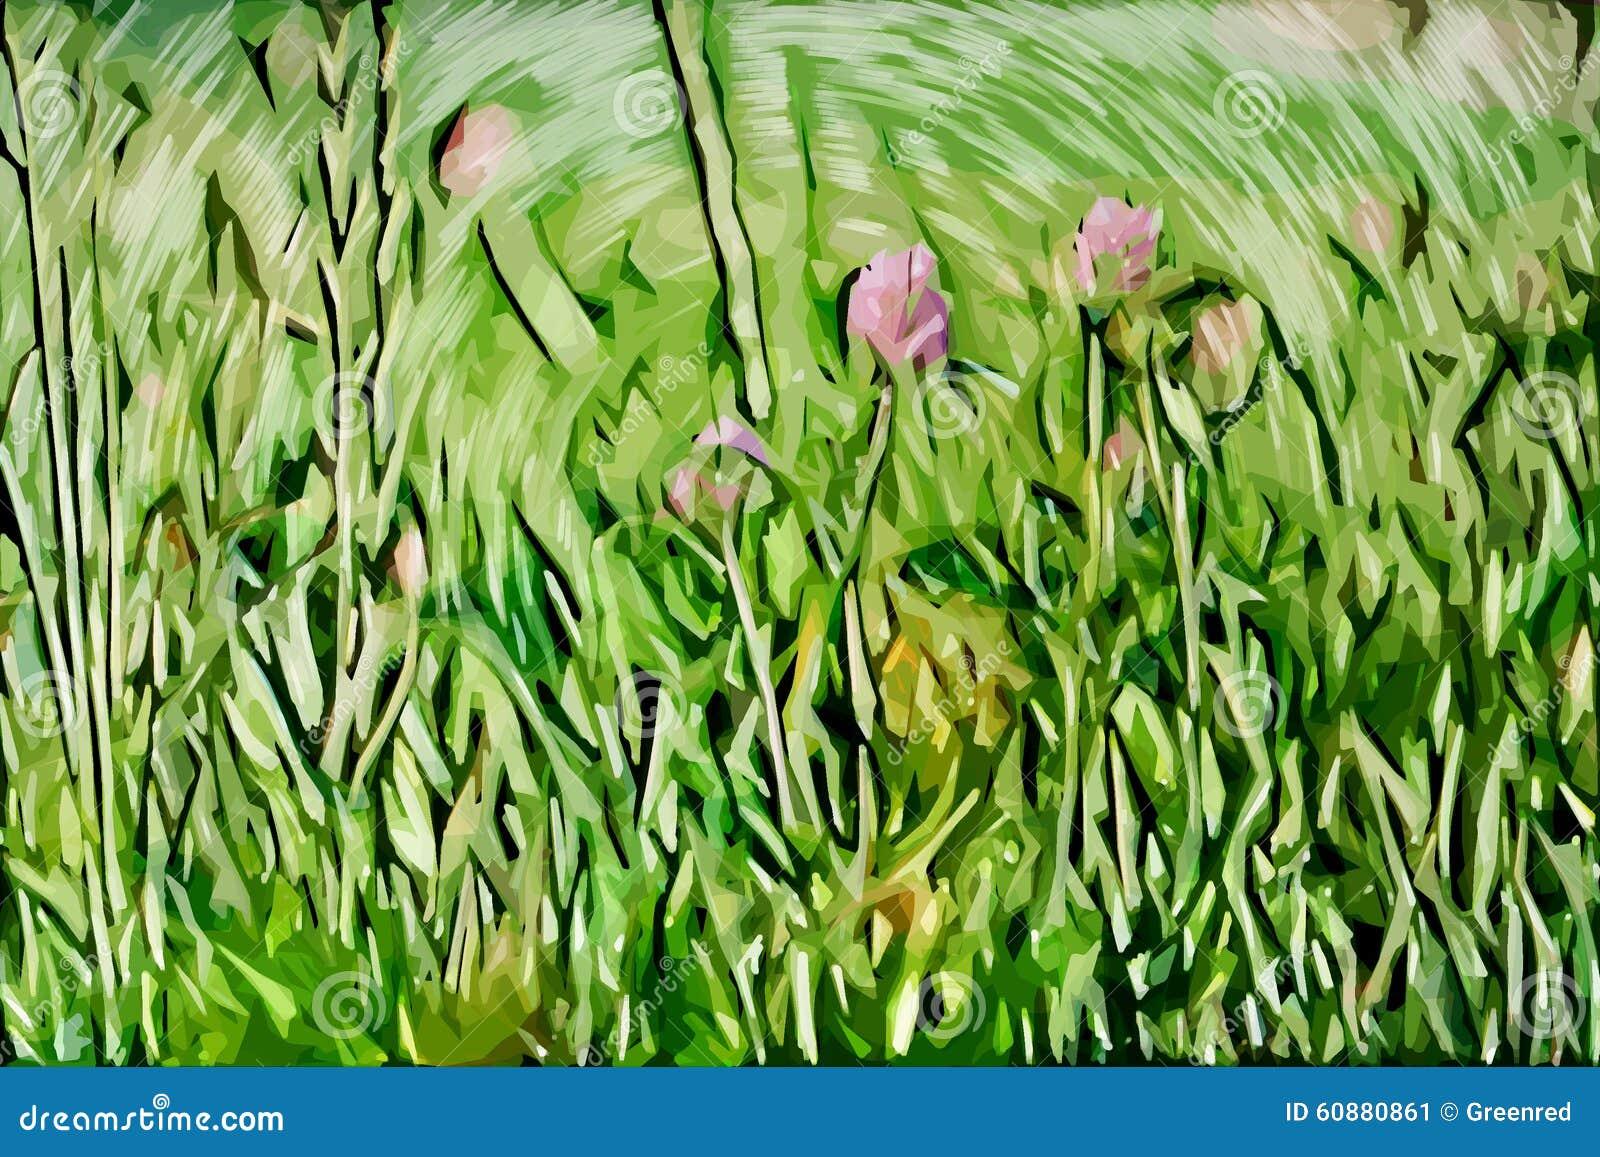 Impressionism painting: Flowers